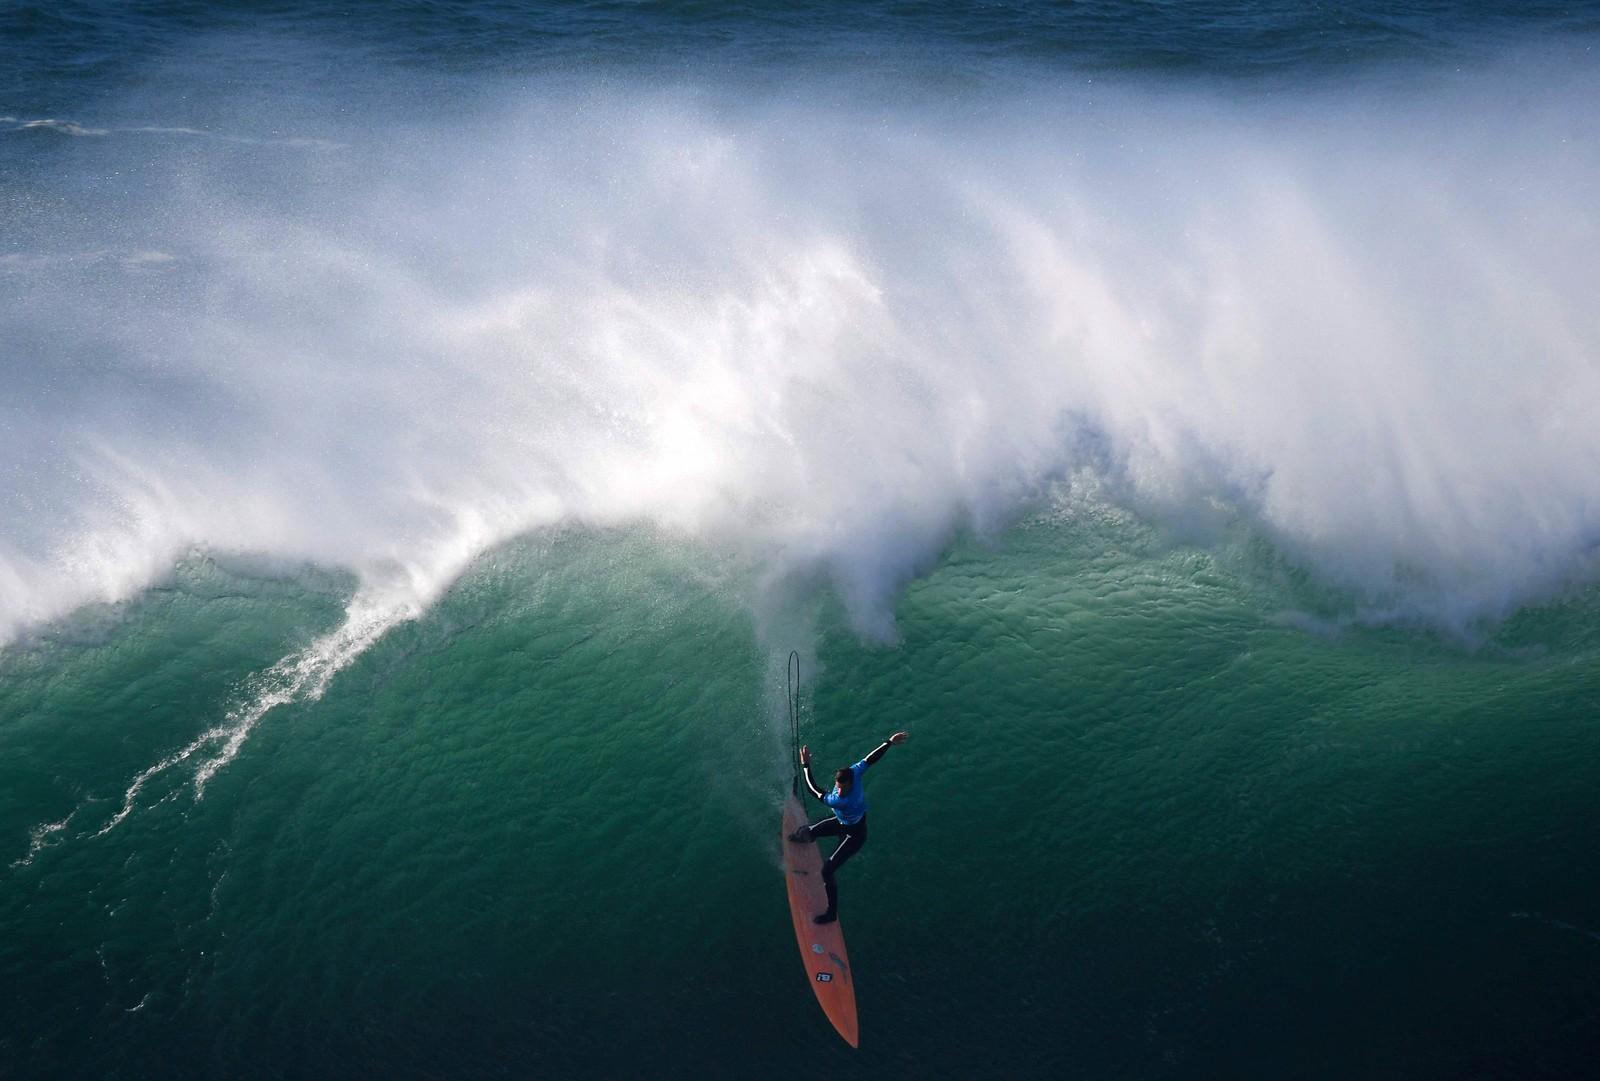 Amerikanske Nic Lamb har funnet en fin bølge ved Praia do Norte i Nazaré i Portugal.